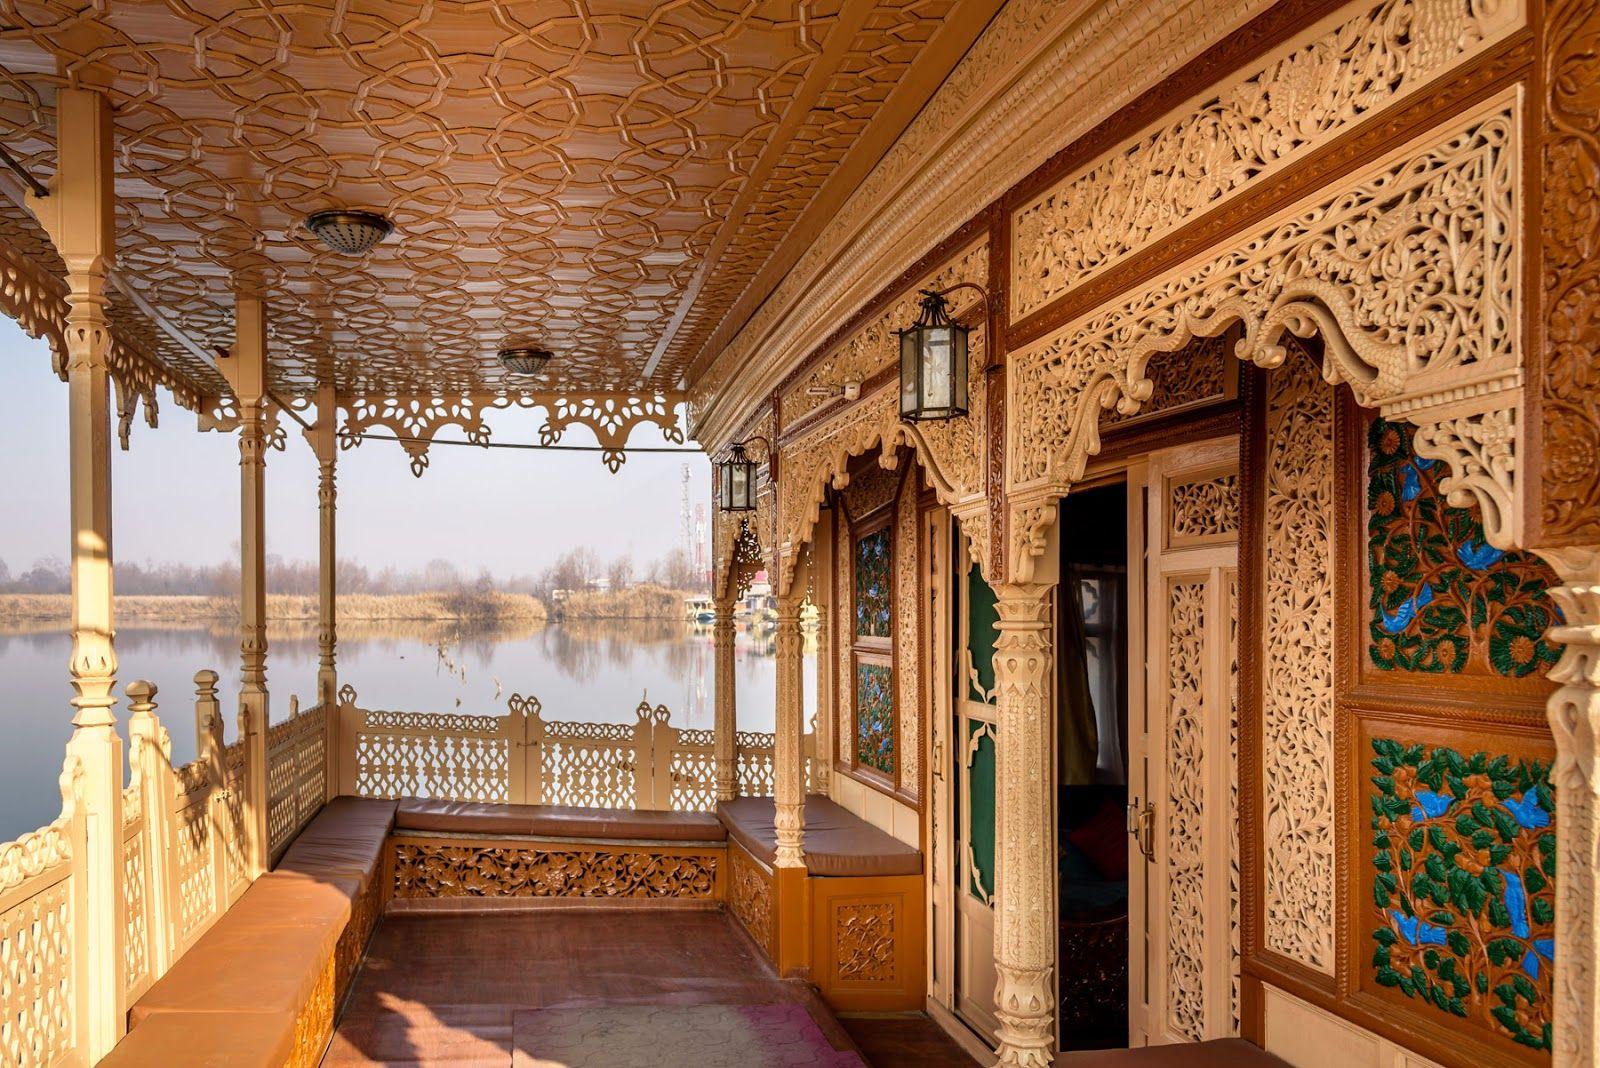 Marvellous Houseboat of Naaz Kashmir....  http://naazkashmir.weebly.com/blog/marvellous-houseboat-of-naaz-kashmir